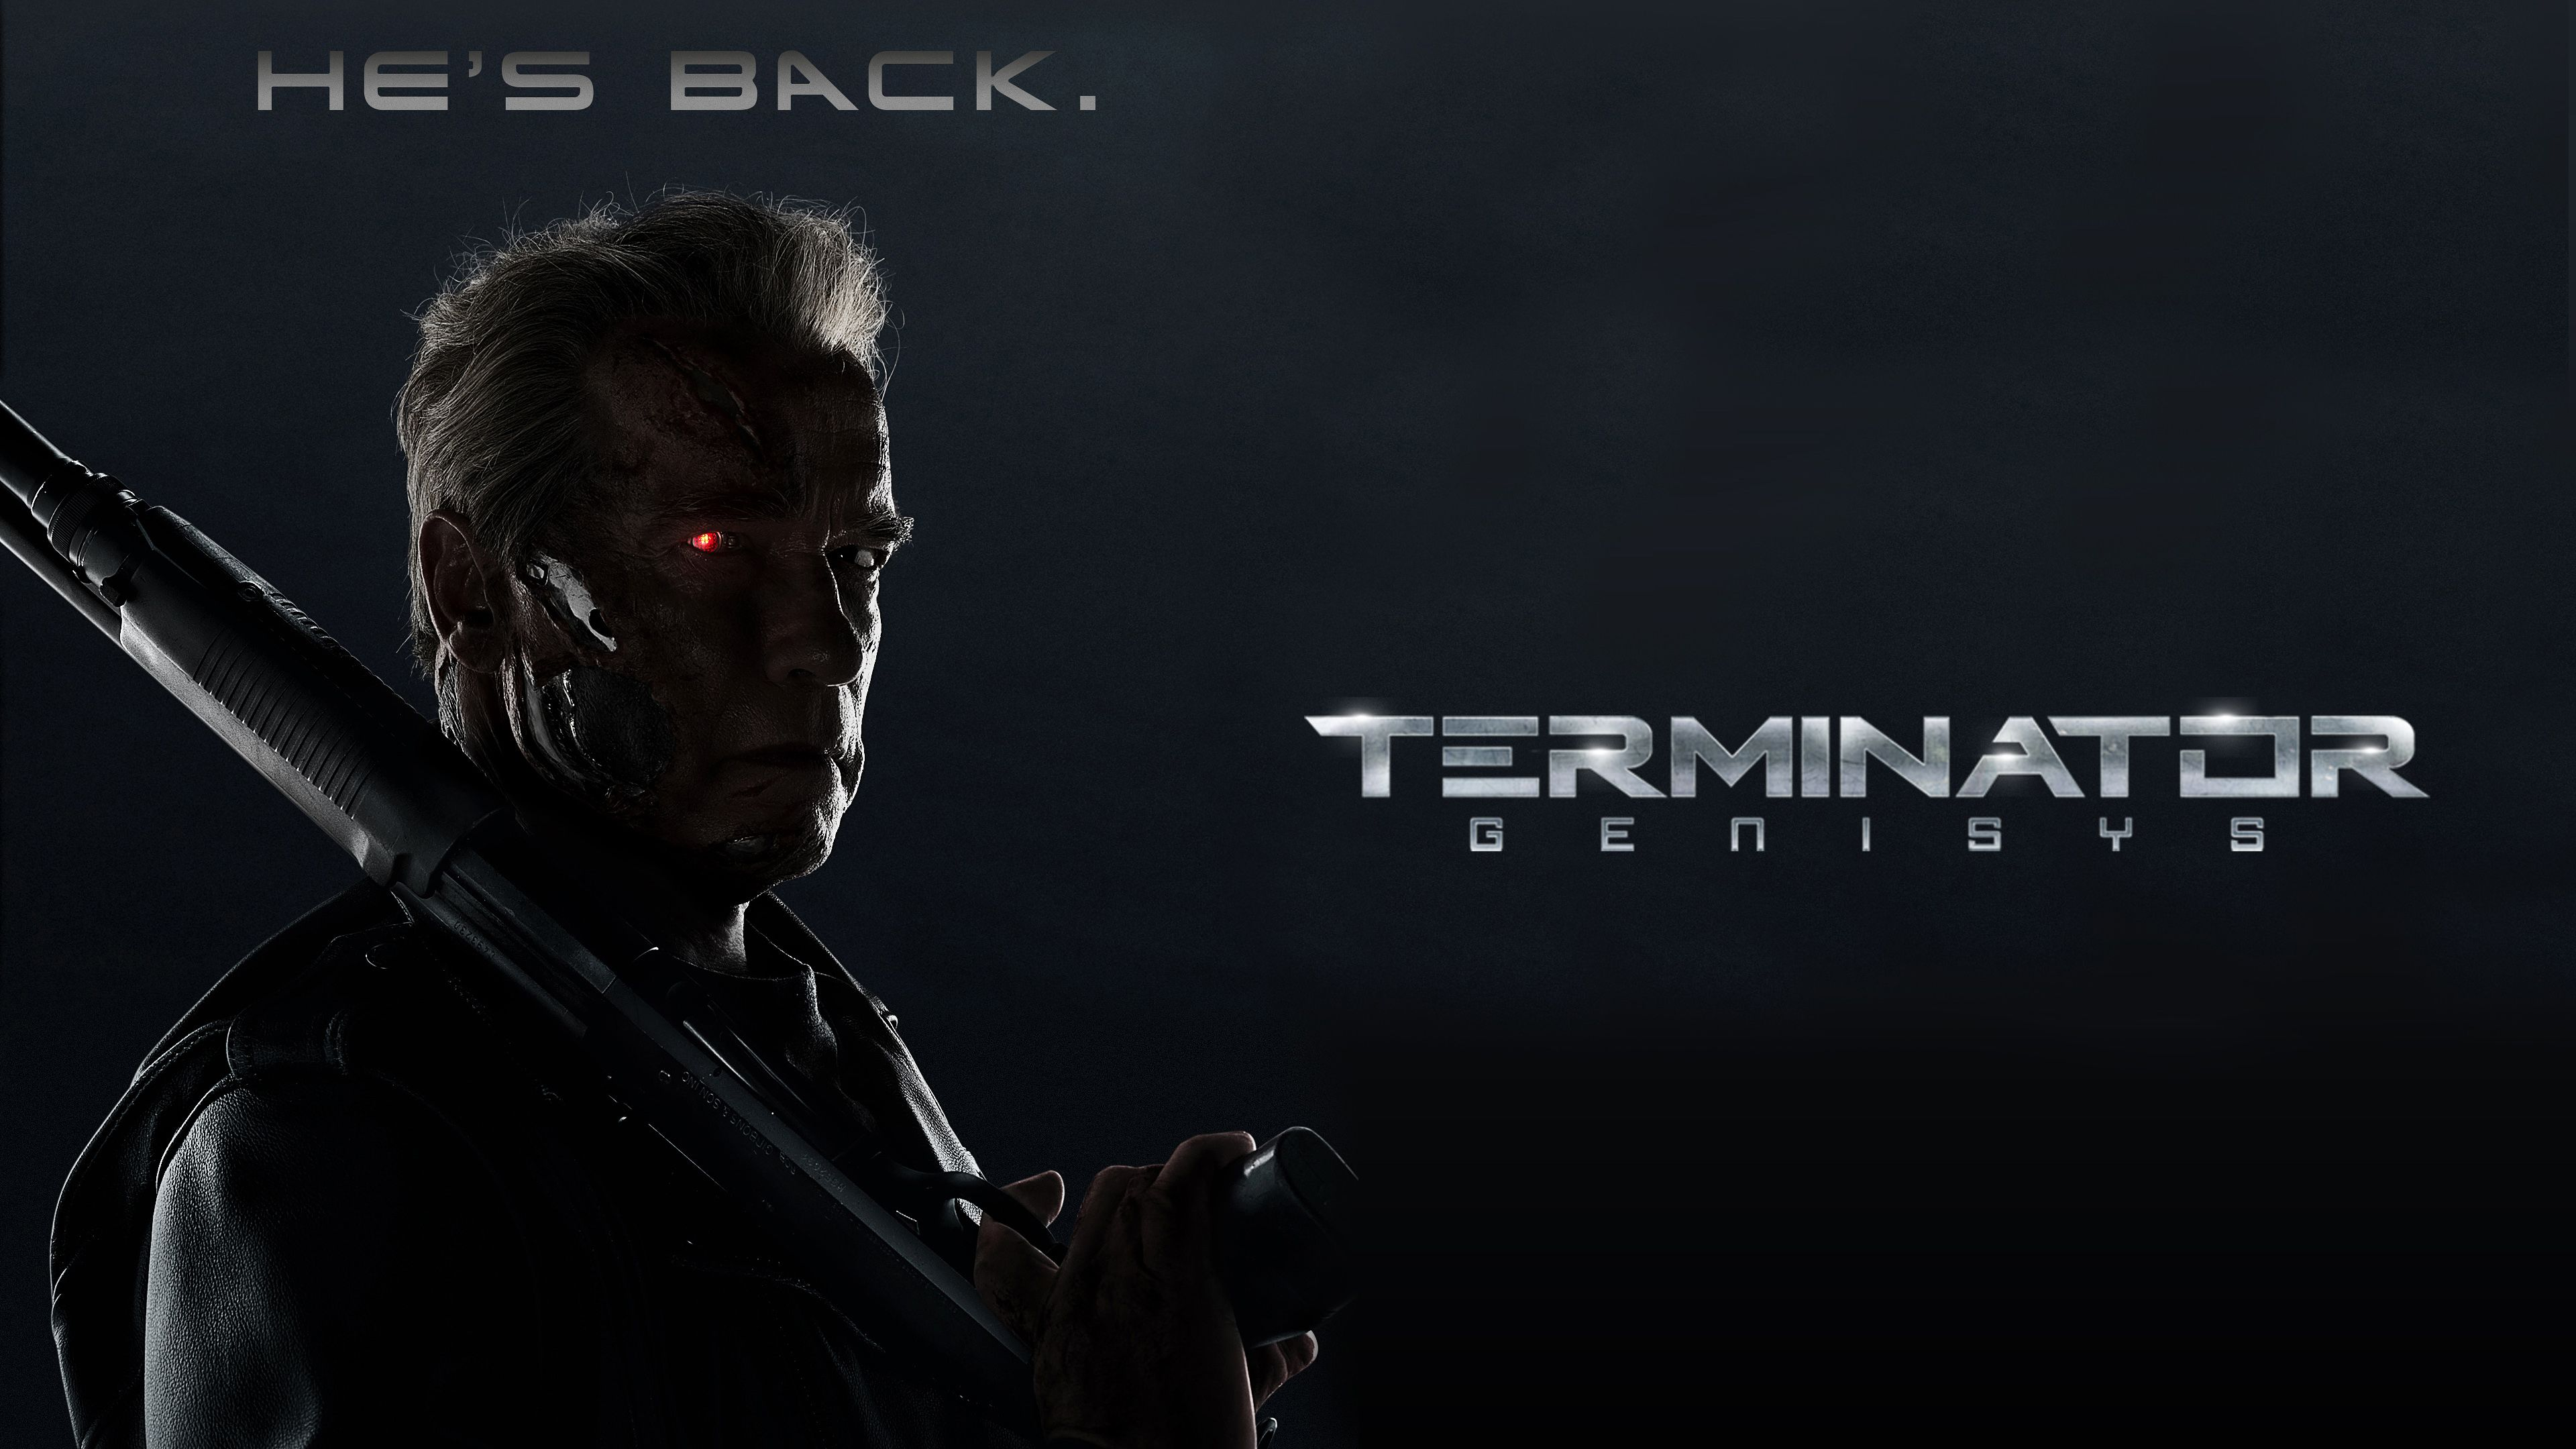 Terminator Genisys Movie Wallpaper #8